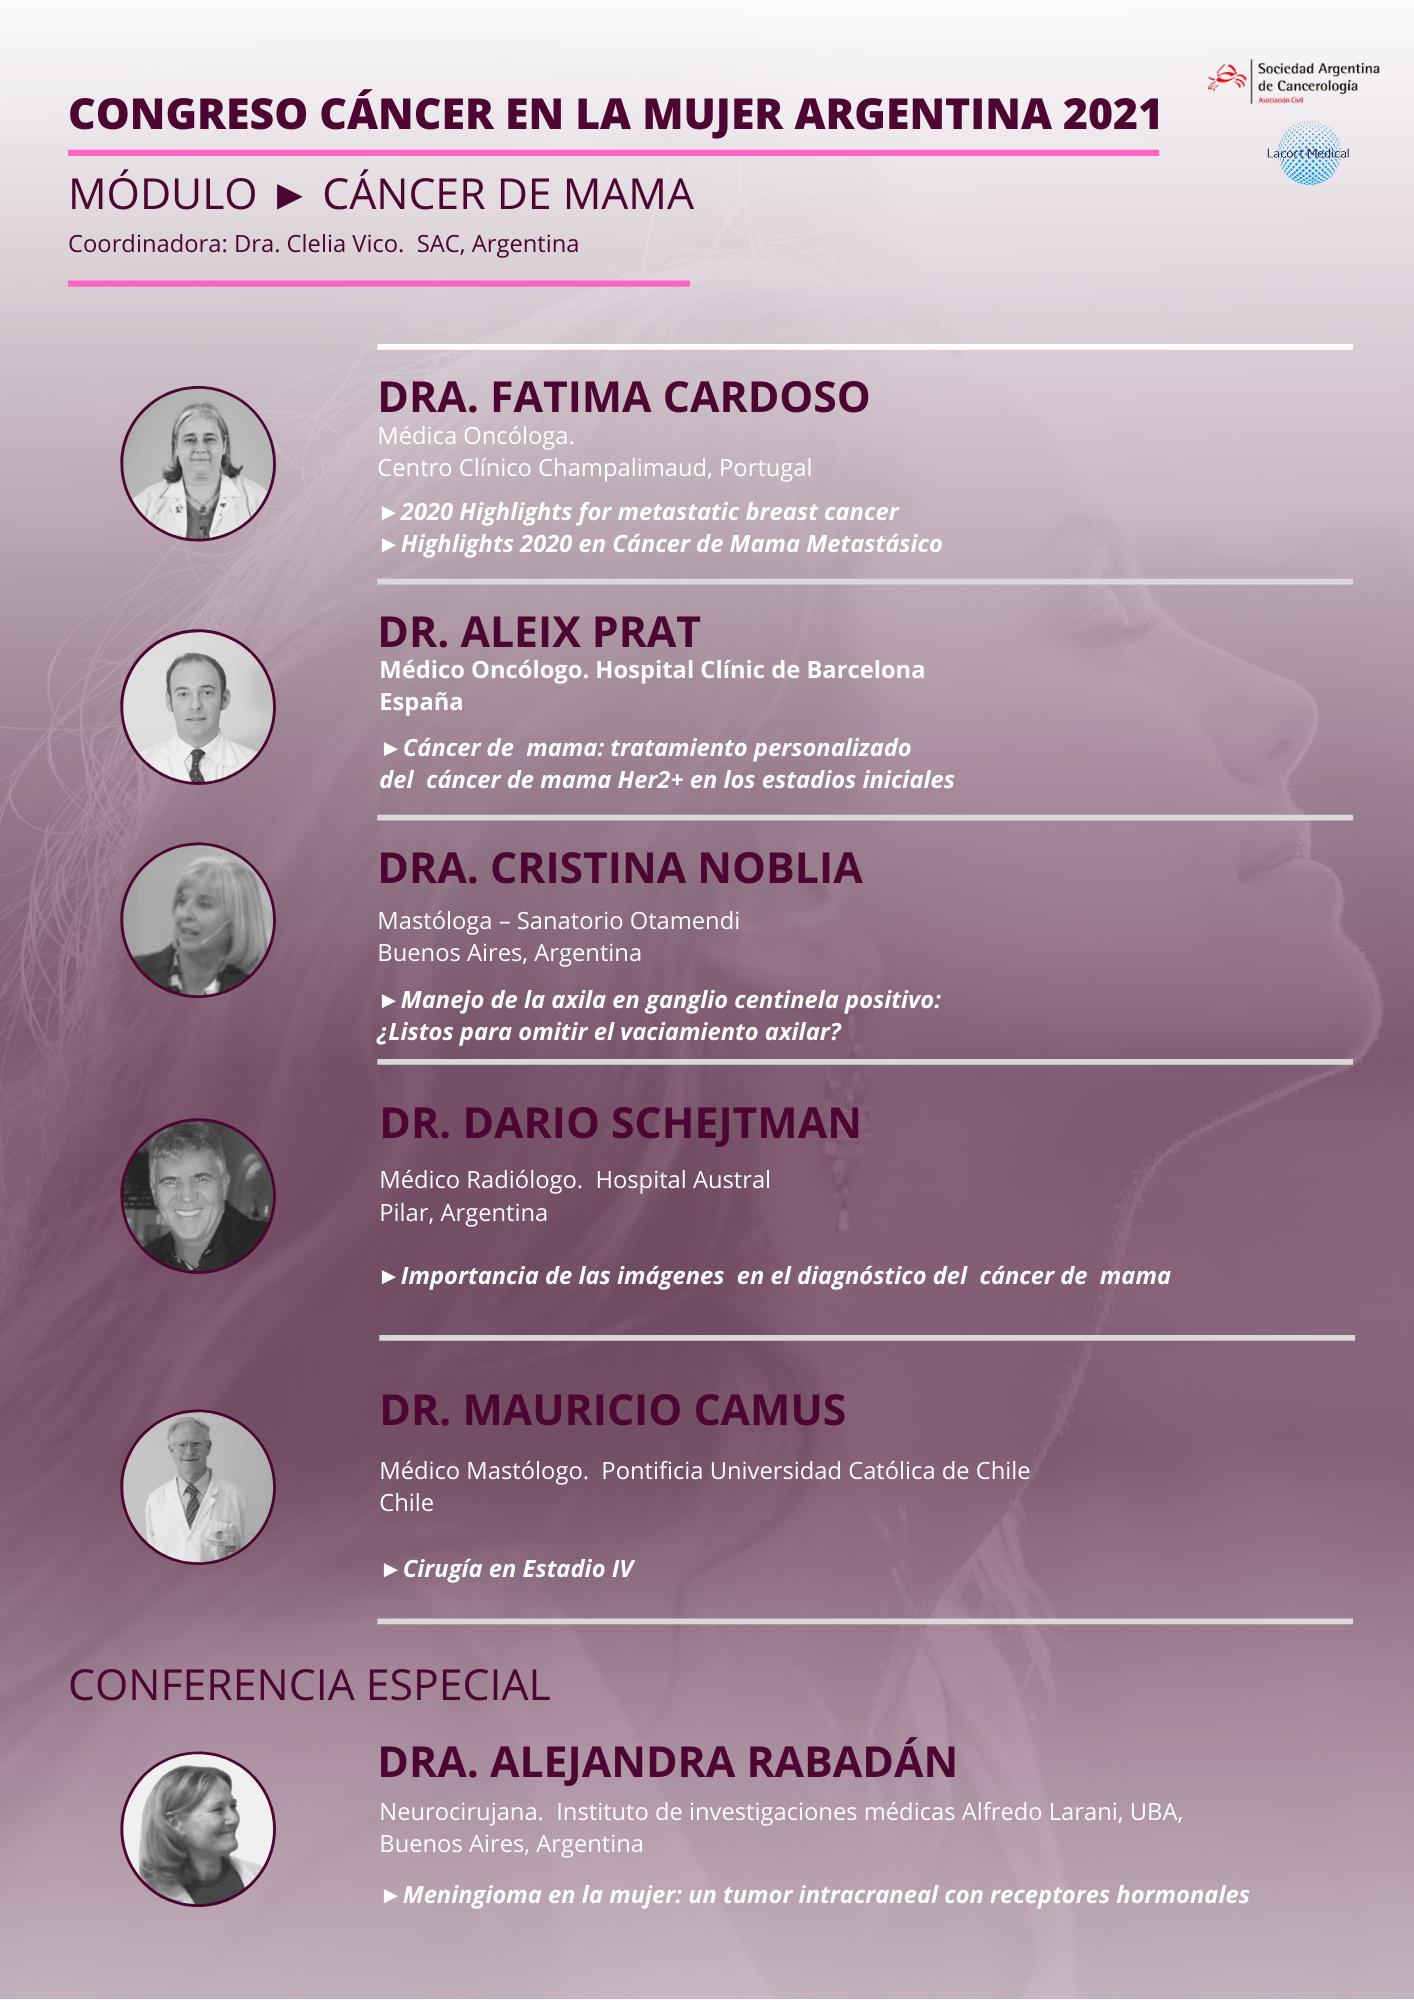 AGENDA ACADEMICA ARGENTINA 2021 (7).png